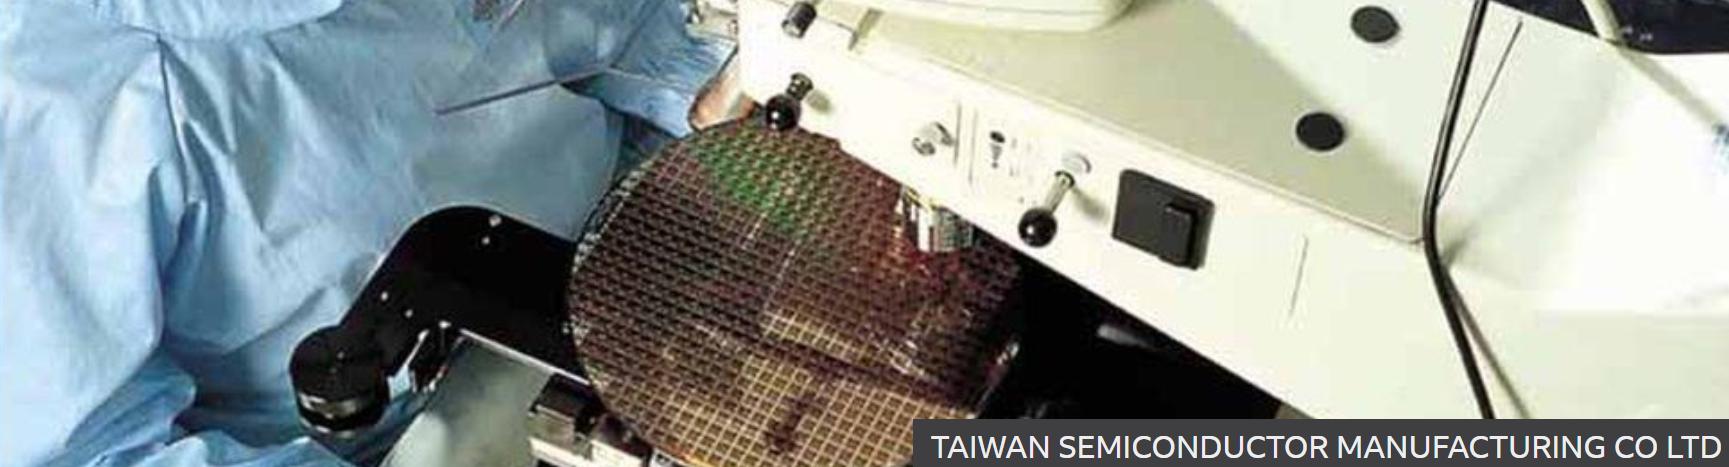 Taiwan biggest producer of semi-conductors